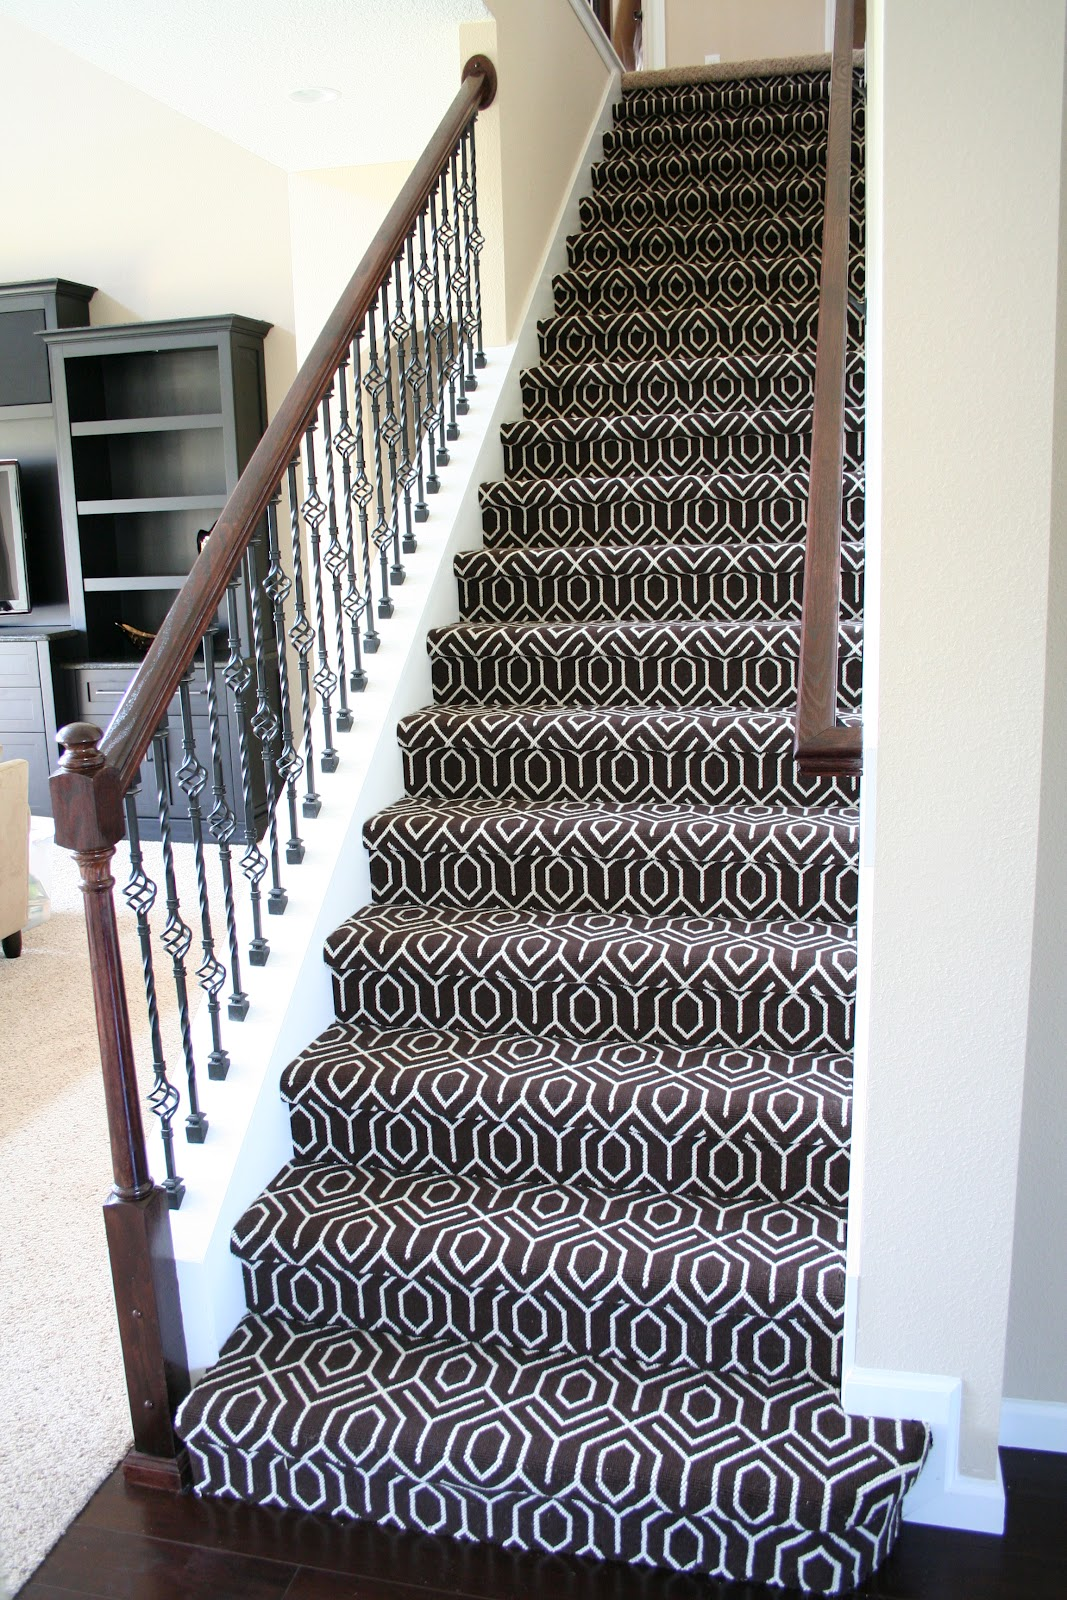 vernon volumes stair carpet. Black Bedroom Furniture Sets. Home Design Ideas